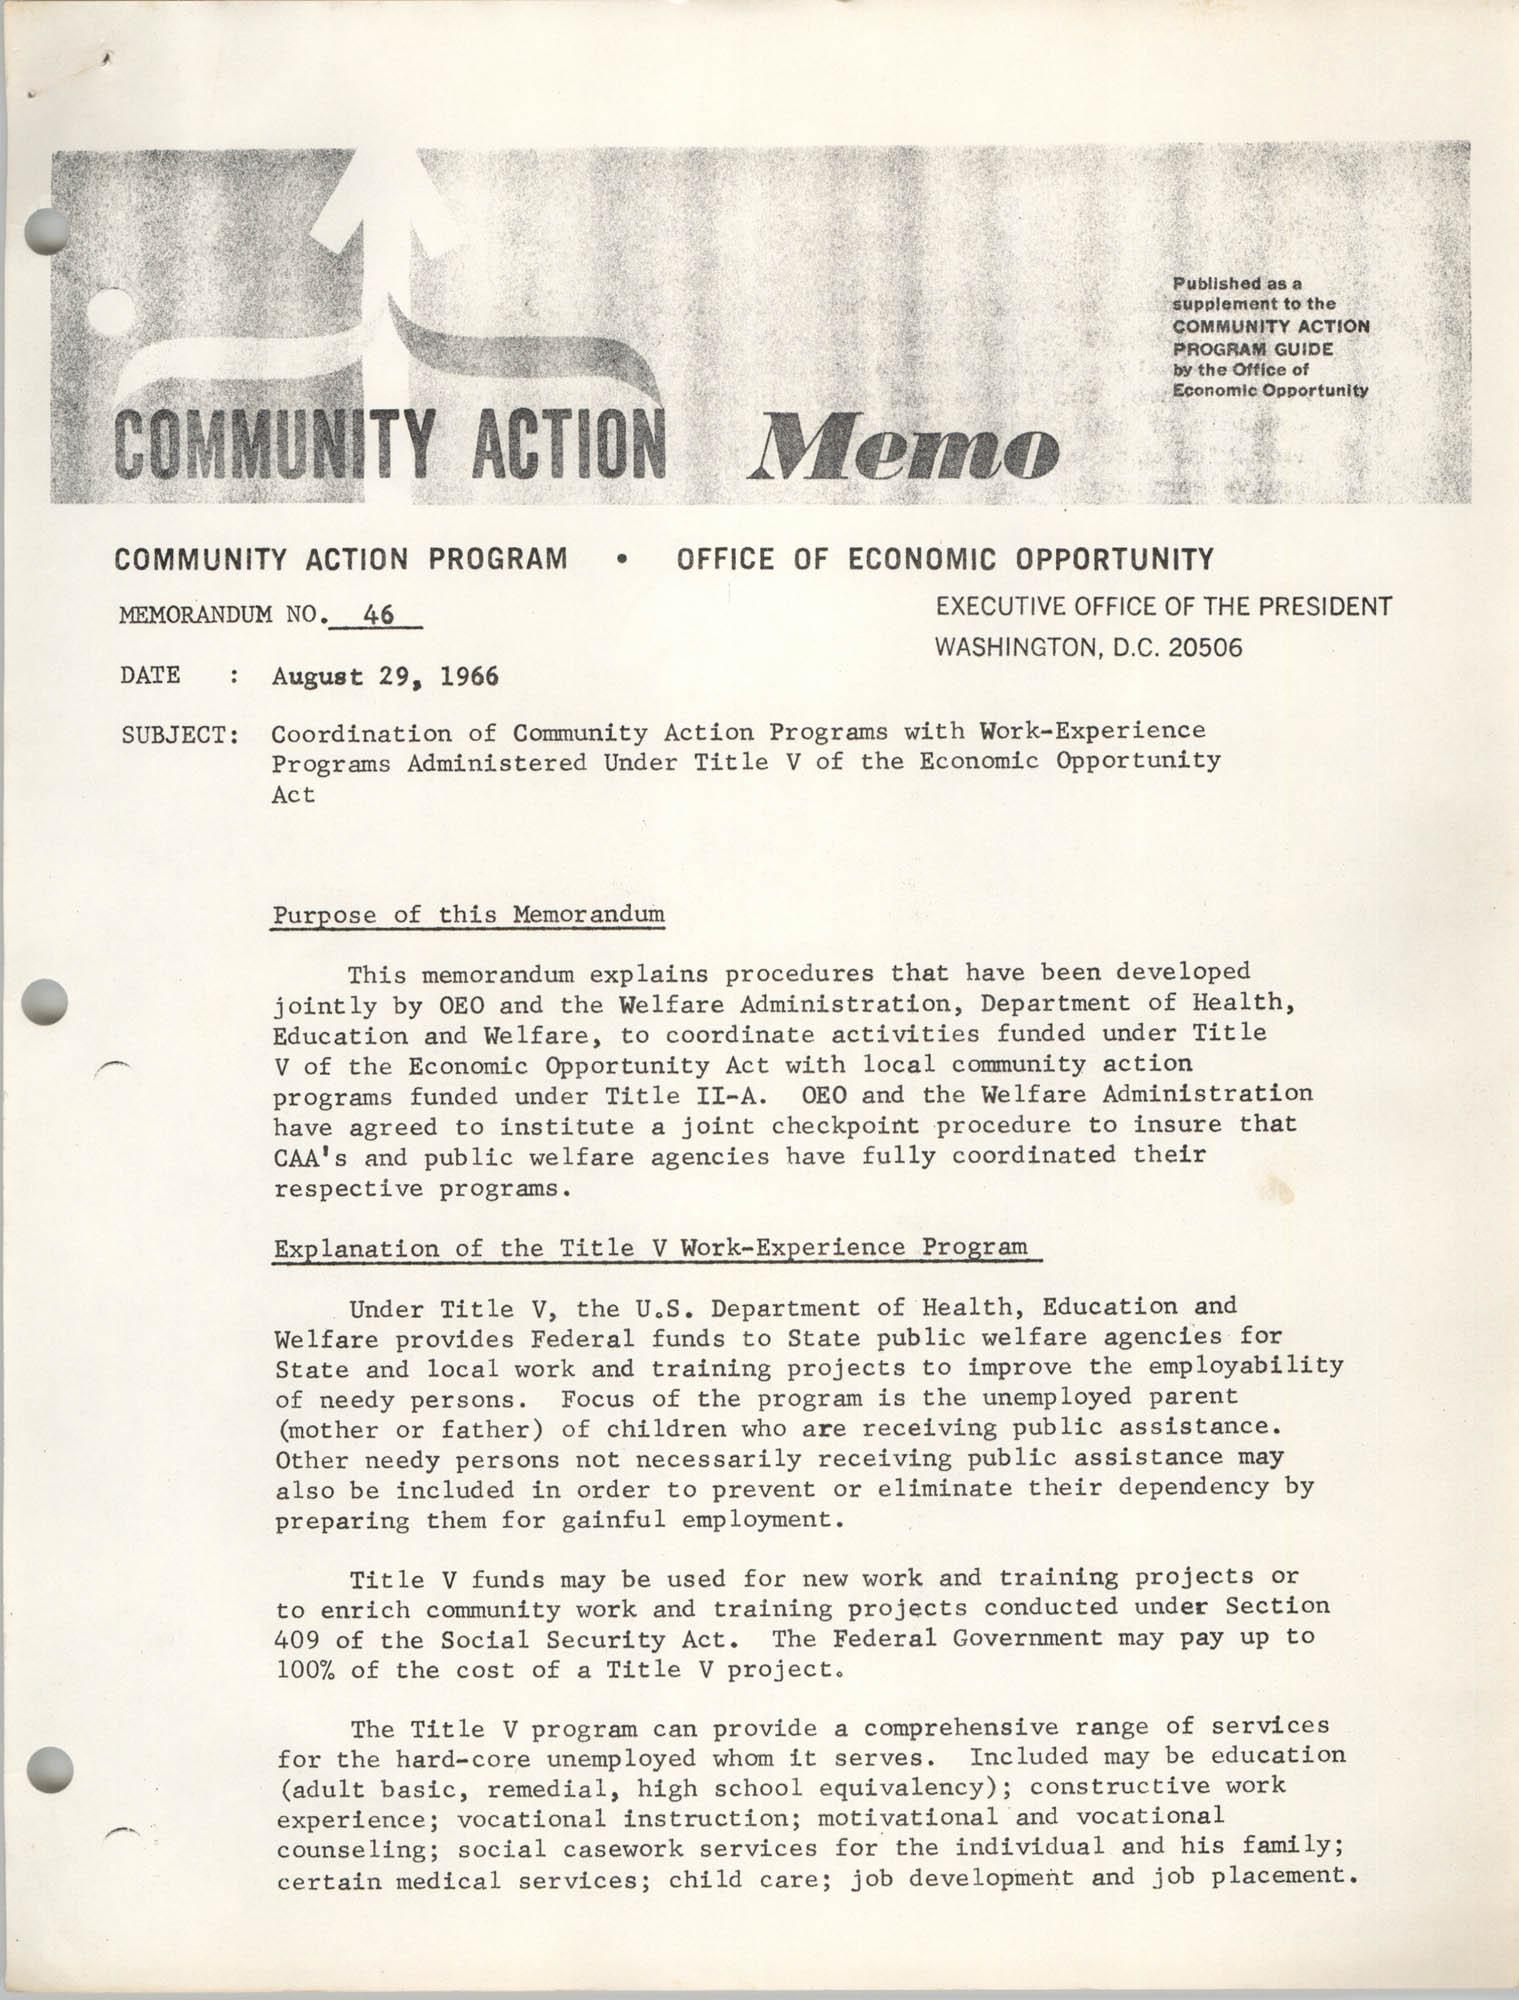 Community Action Program Memorandum No. 46, Memo Page 1